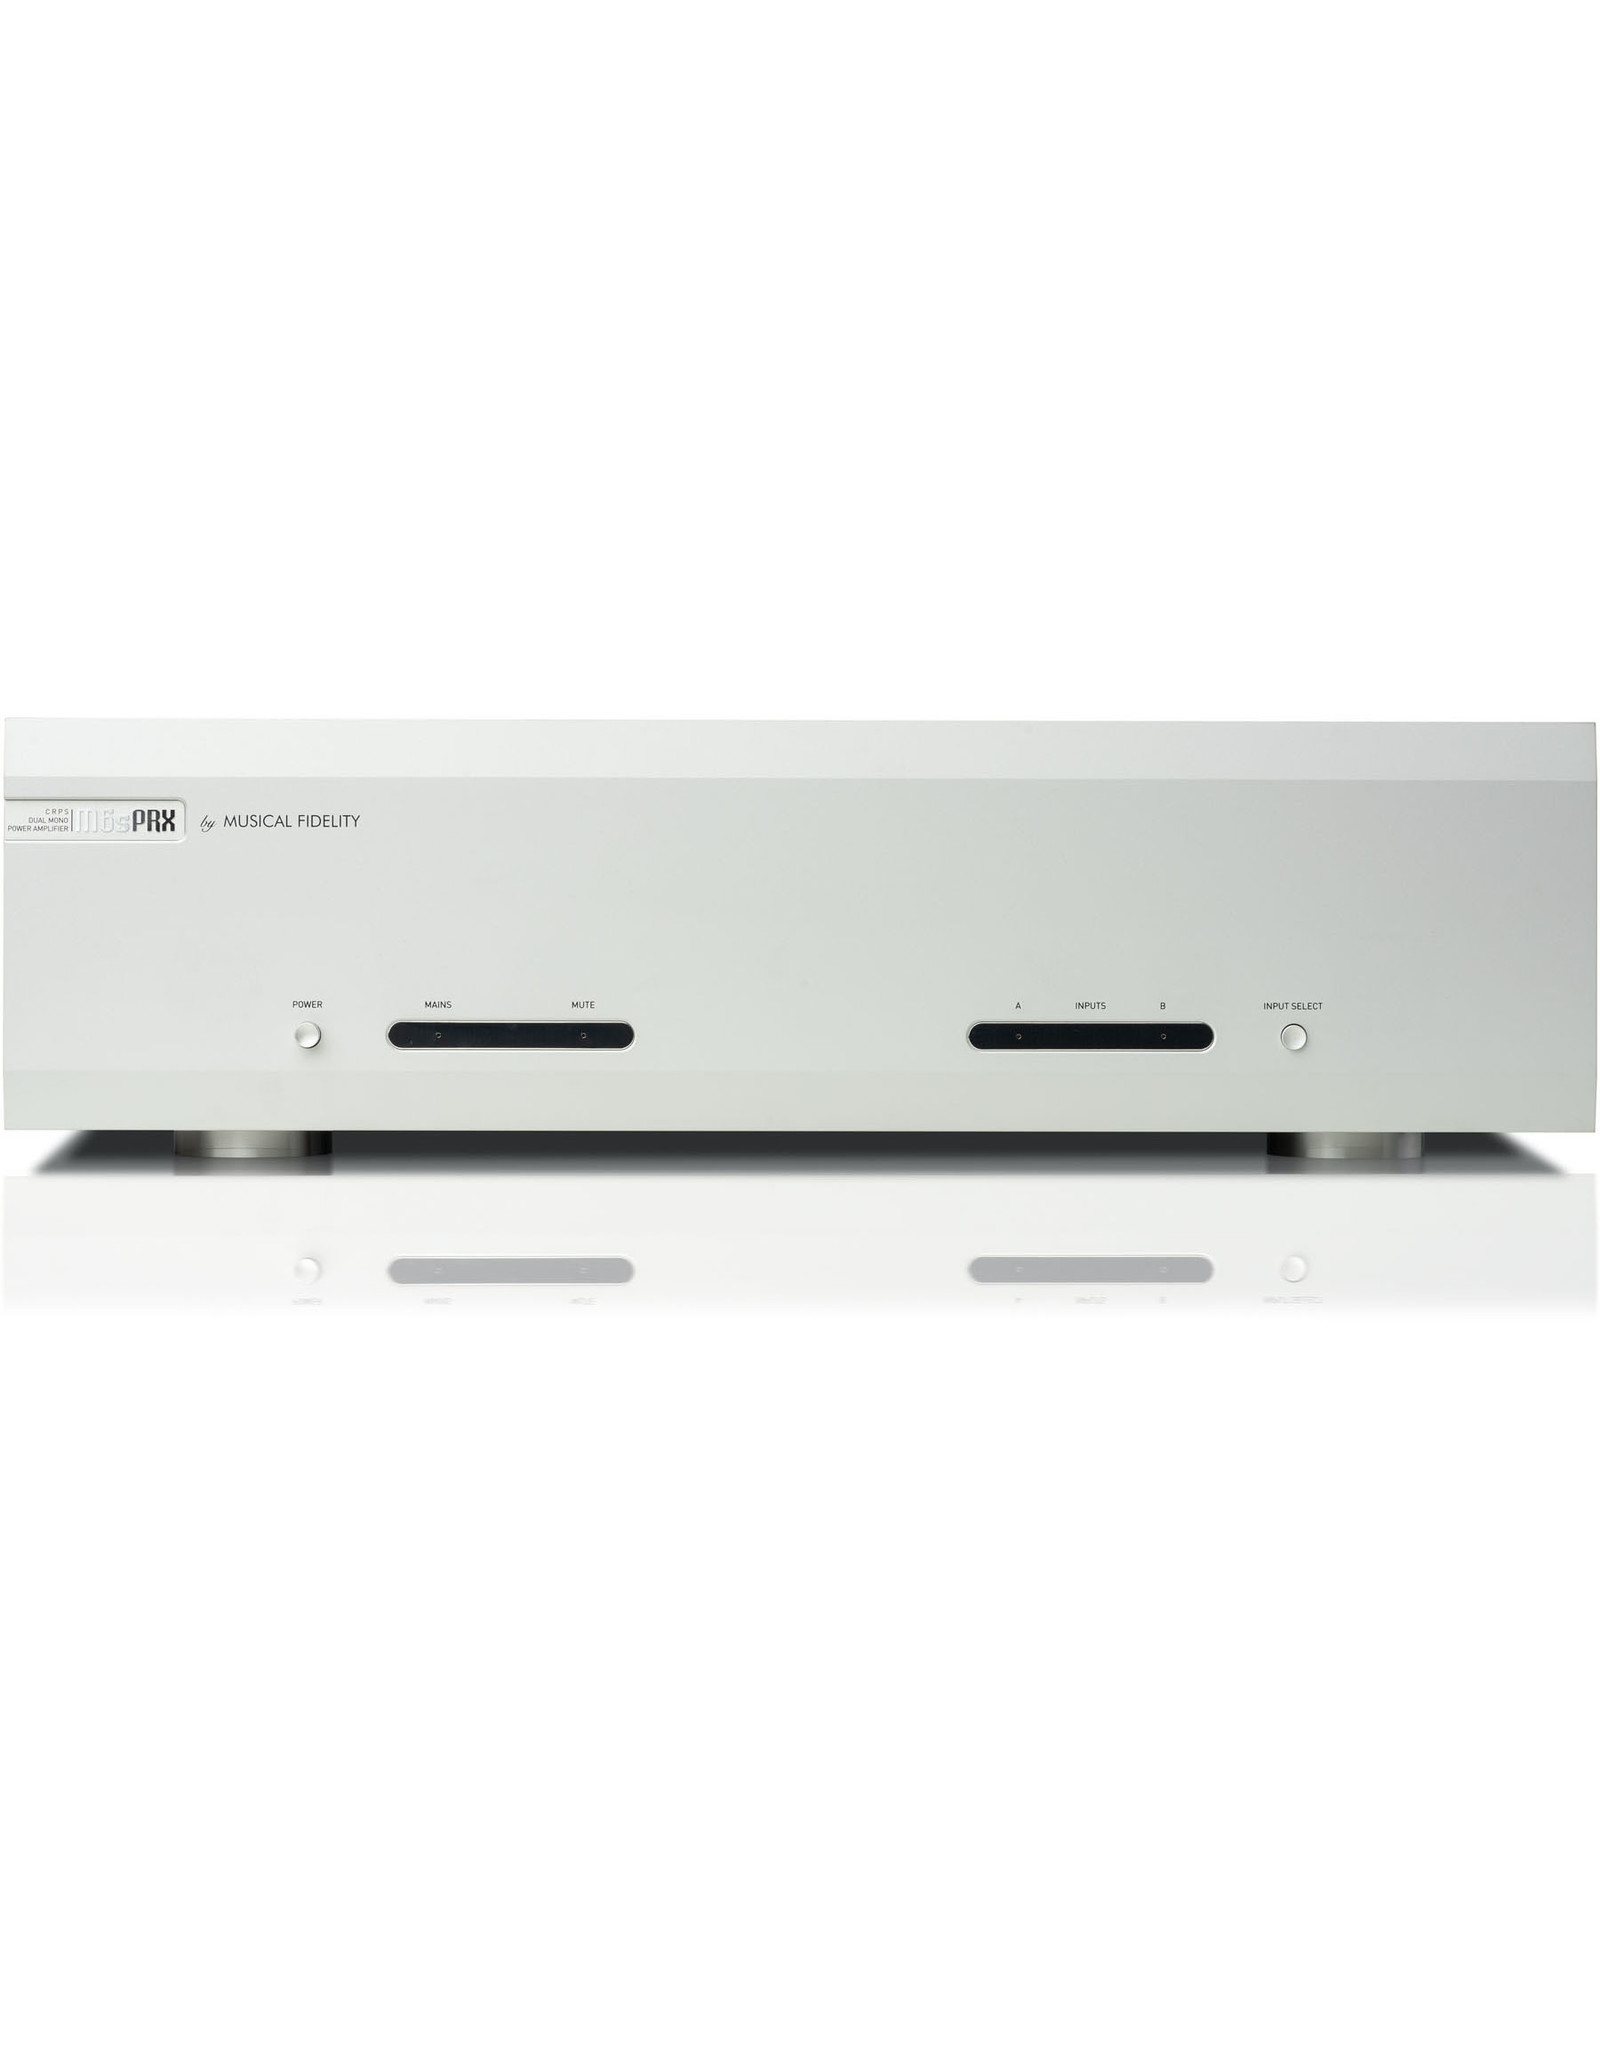 Musical Fidelity Musical Fidelity M6s PRX Power Amplifier